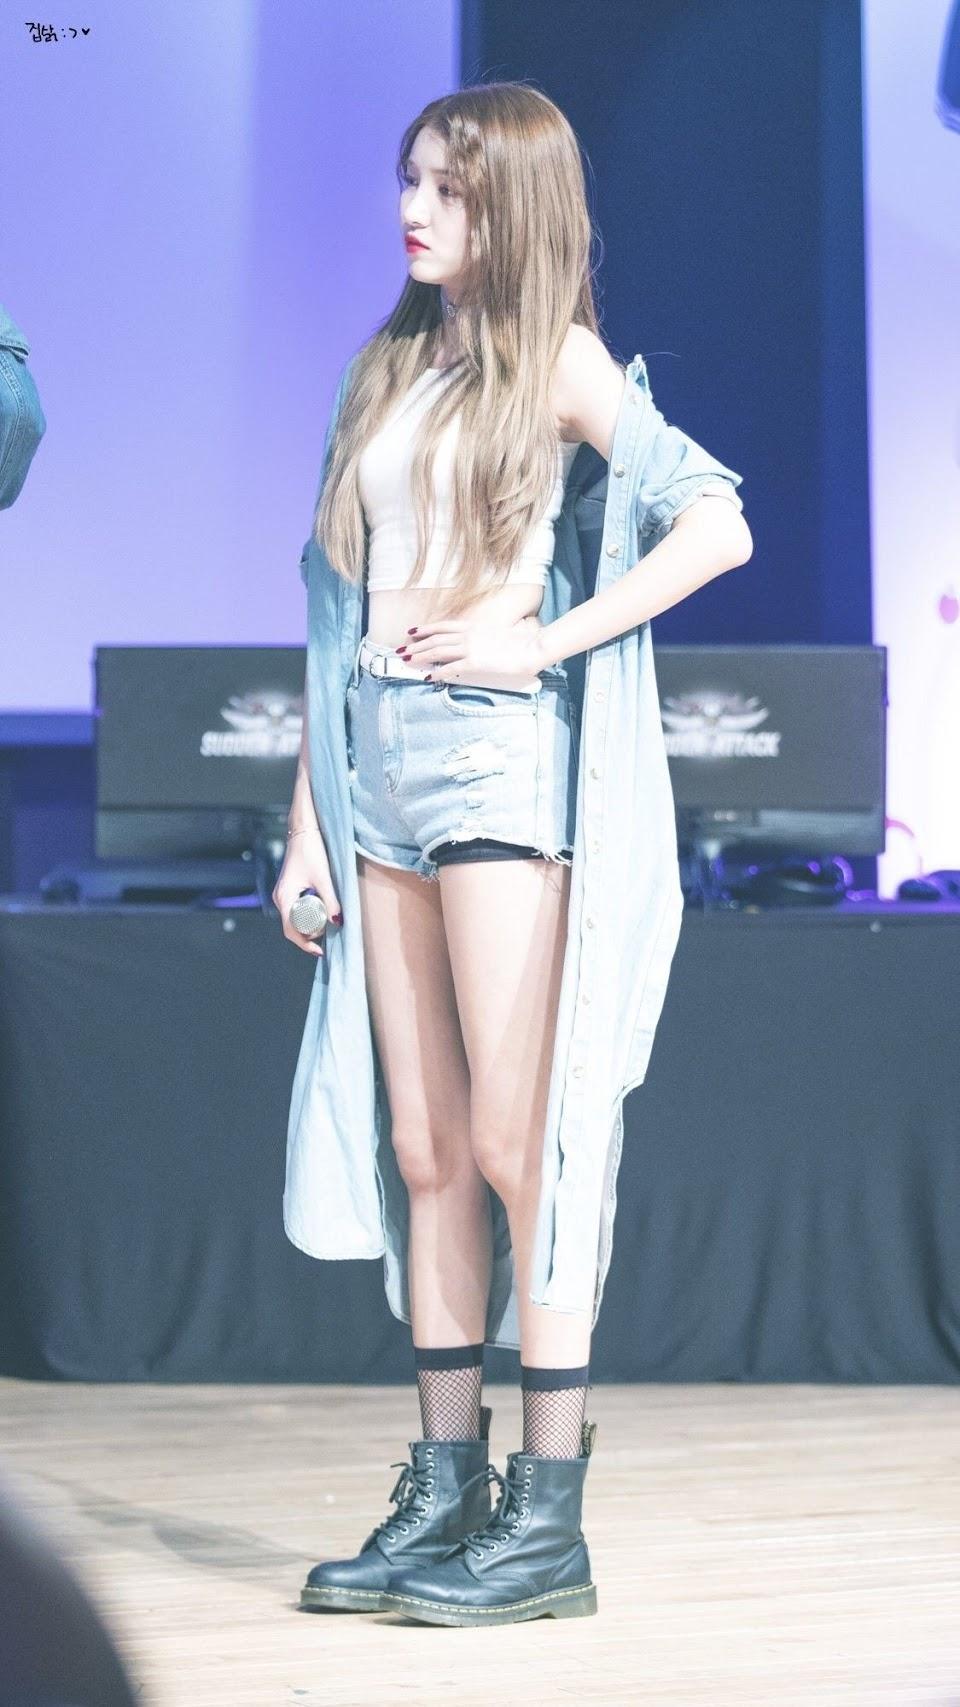 sowon body 19